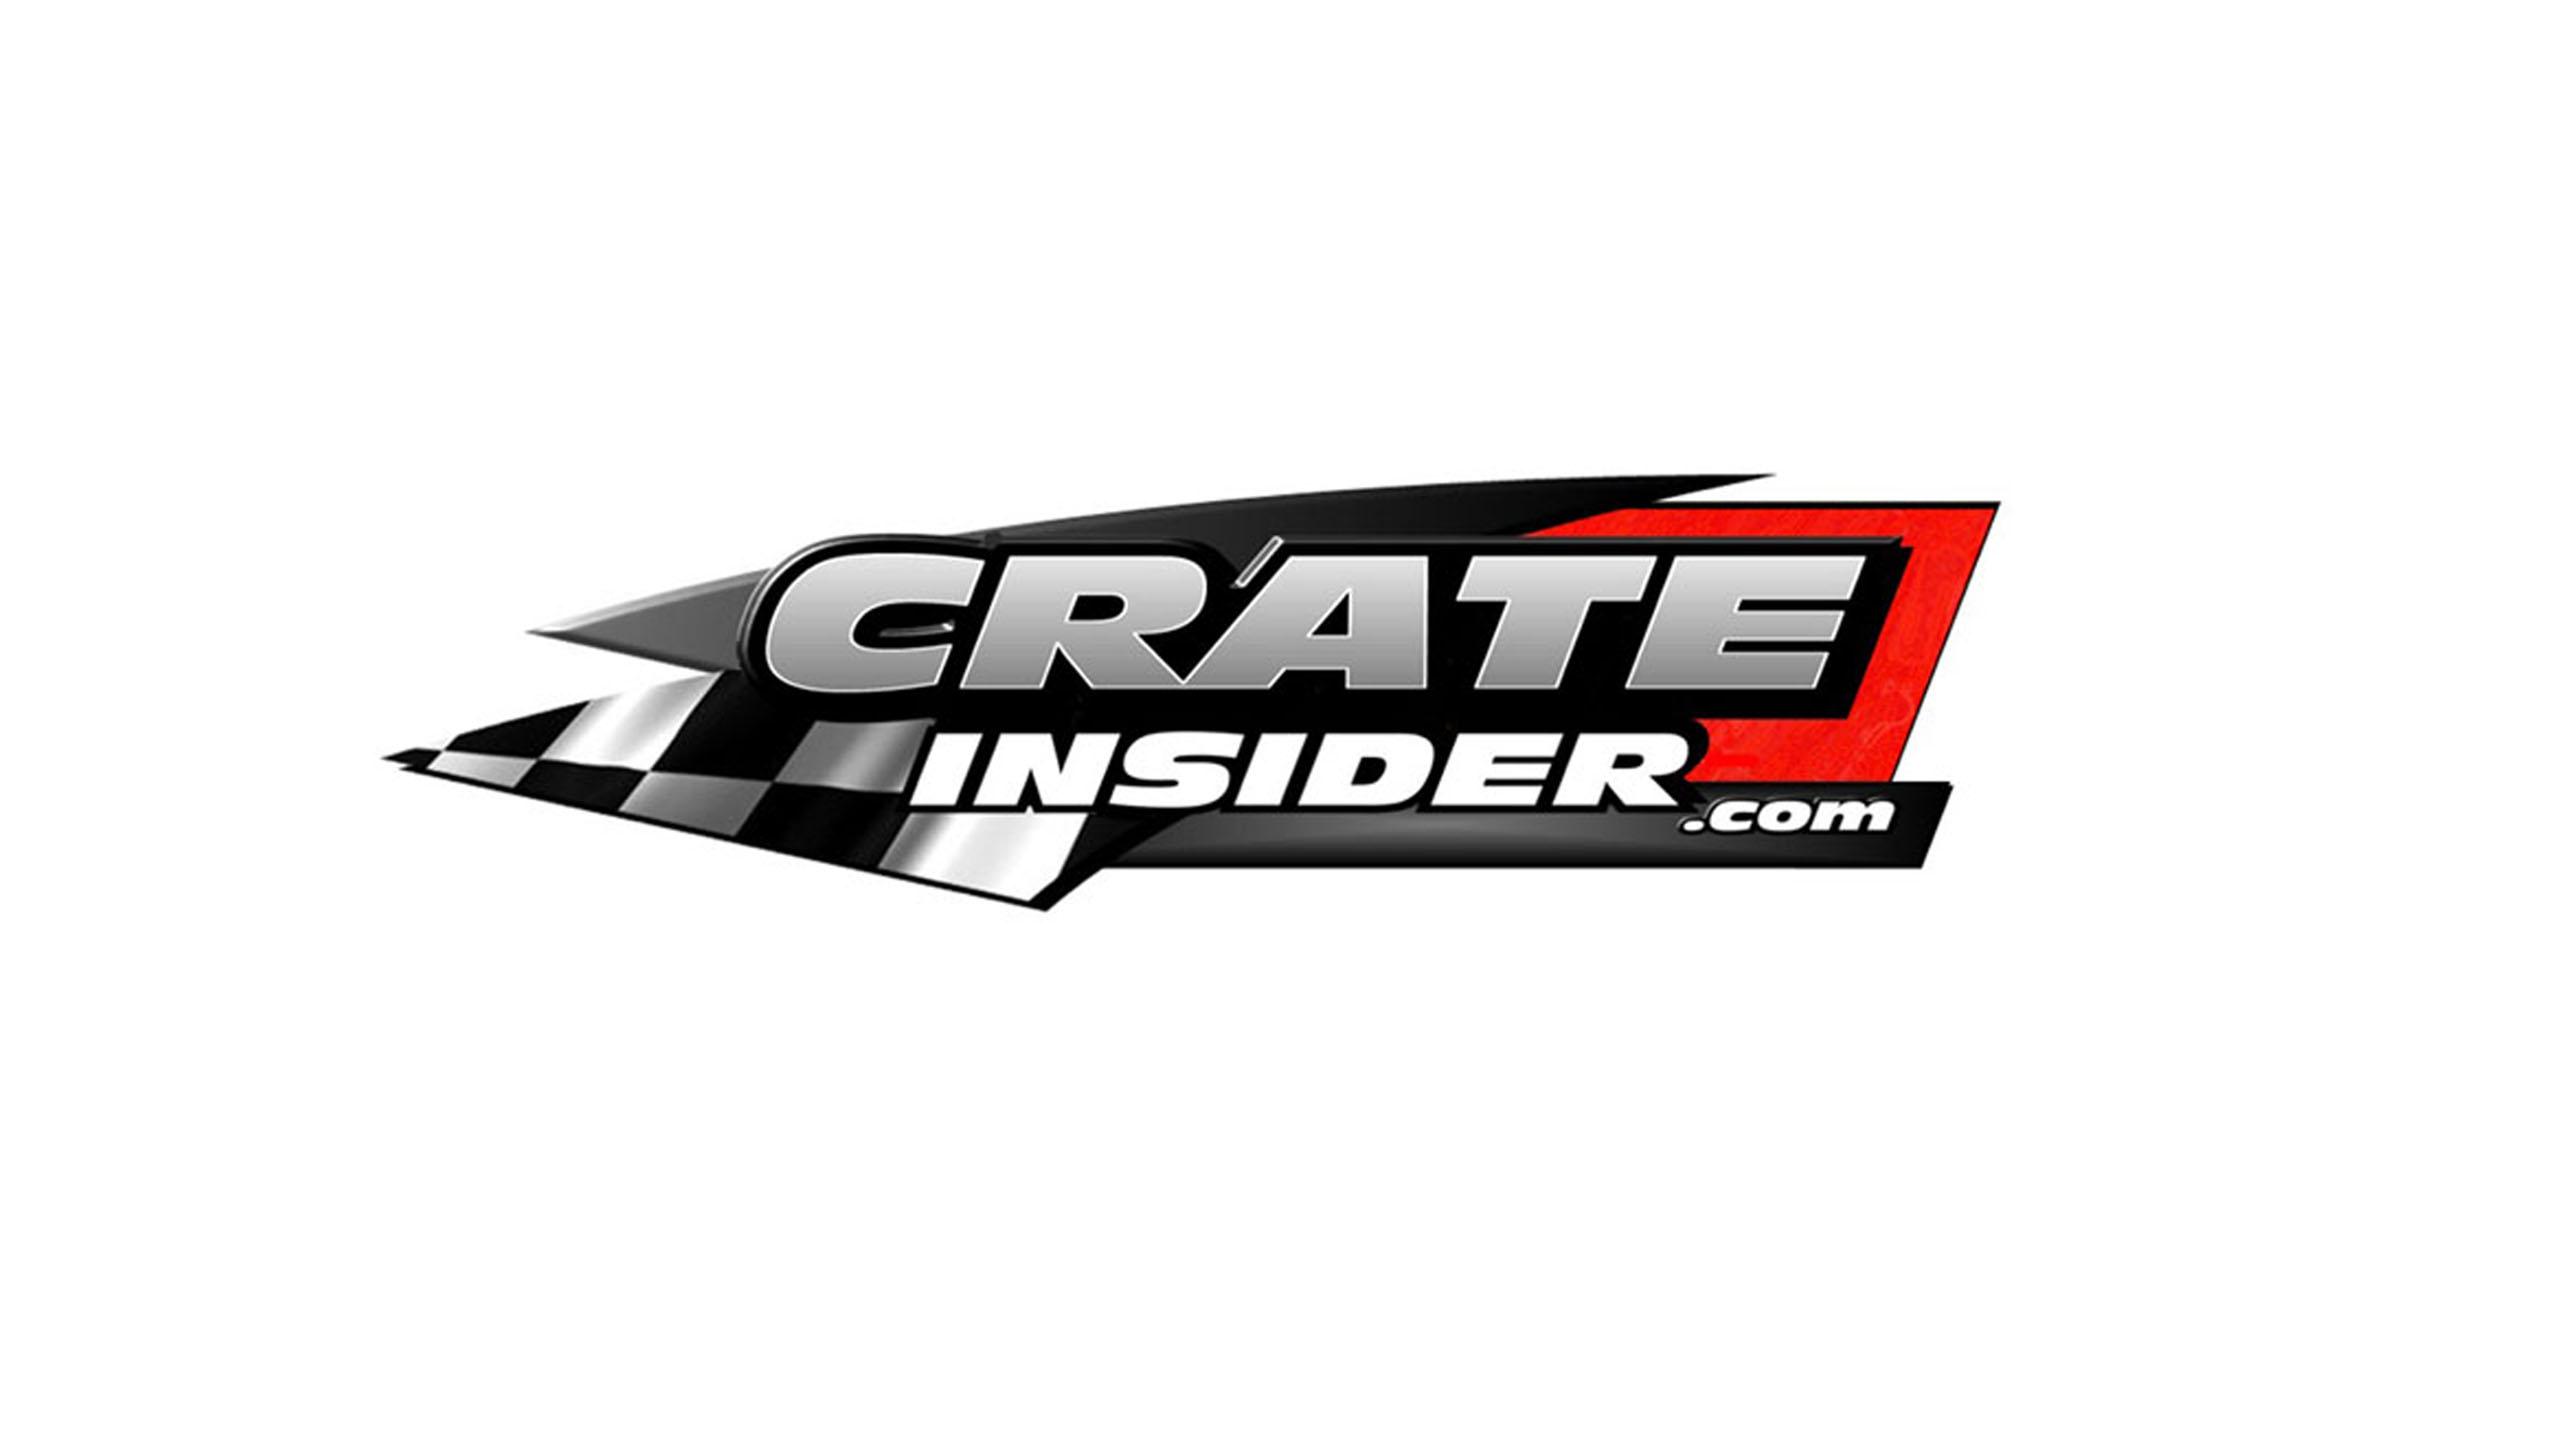 Crate Insider